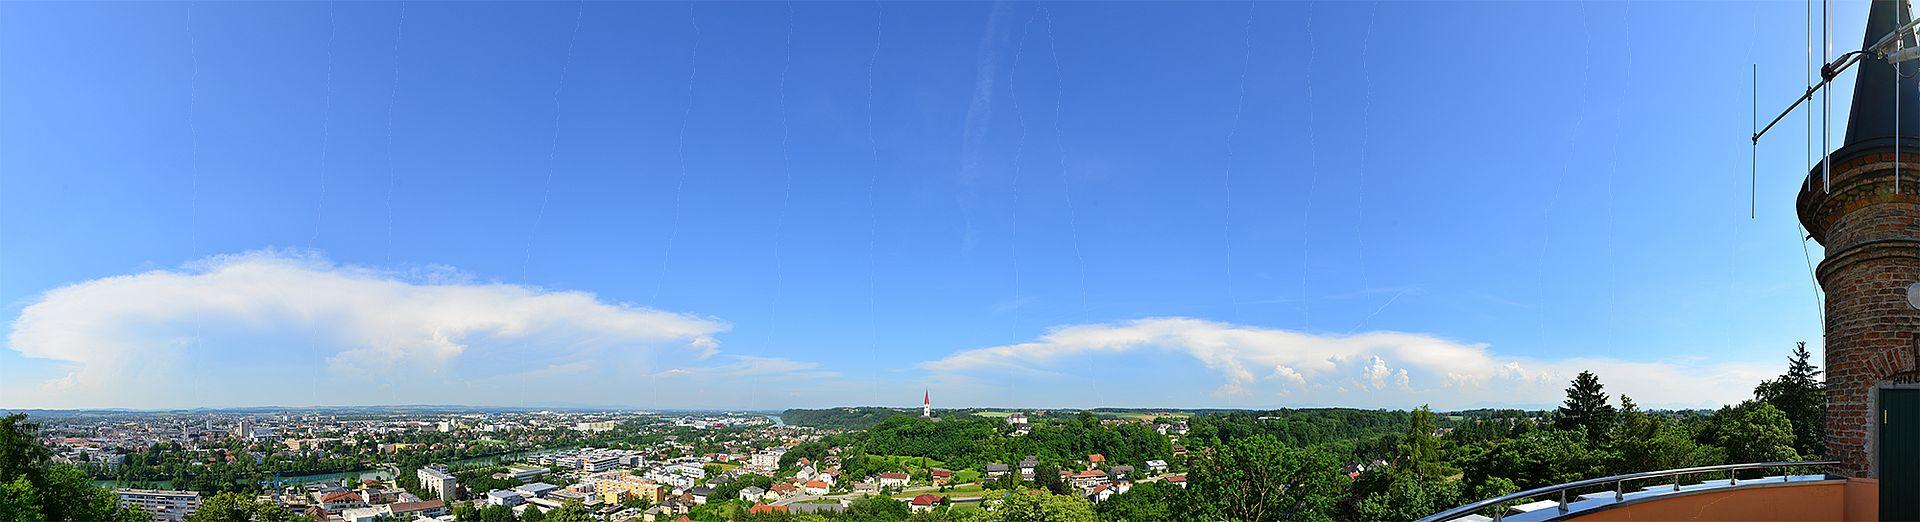 Panorama Ausblick Marienwarte